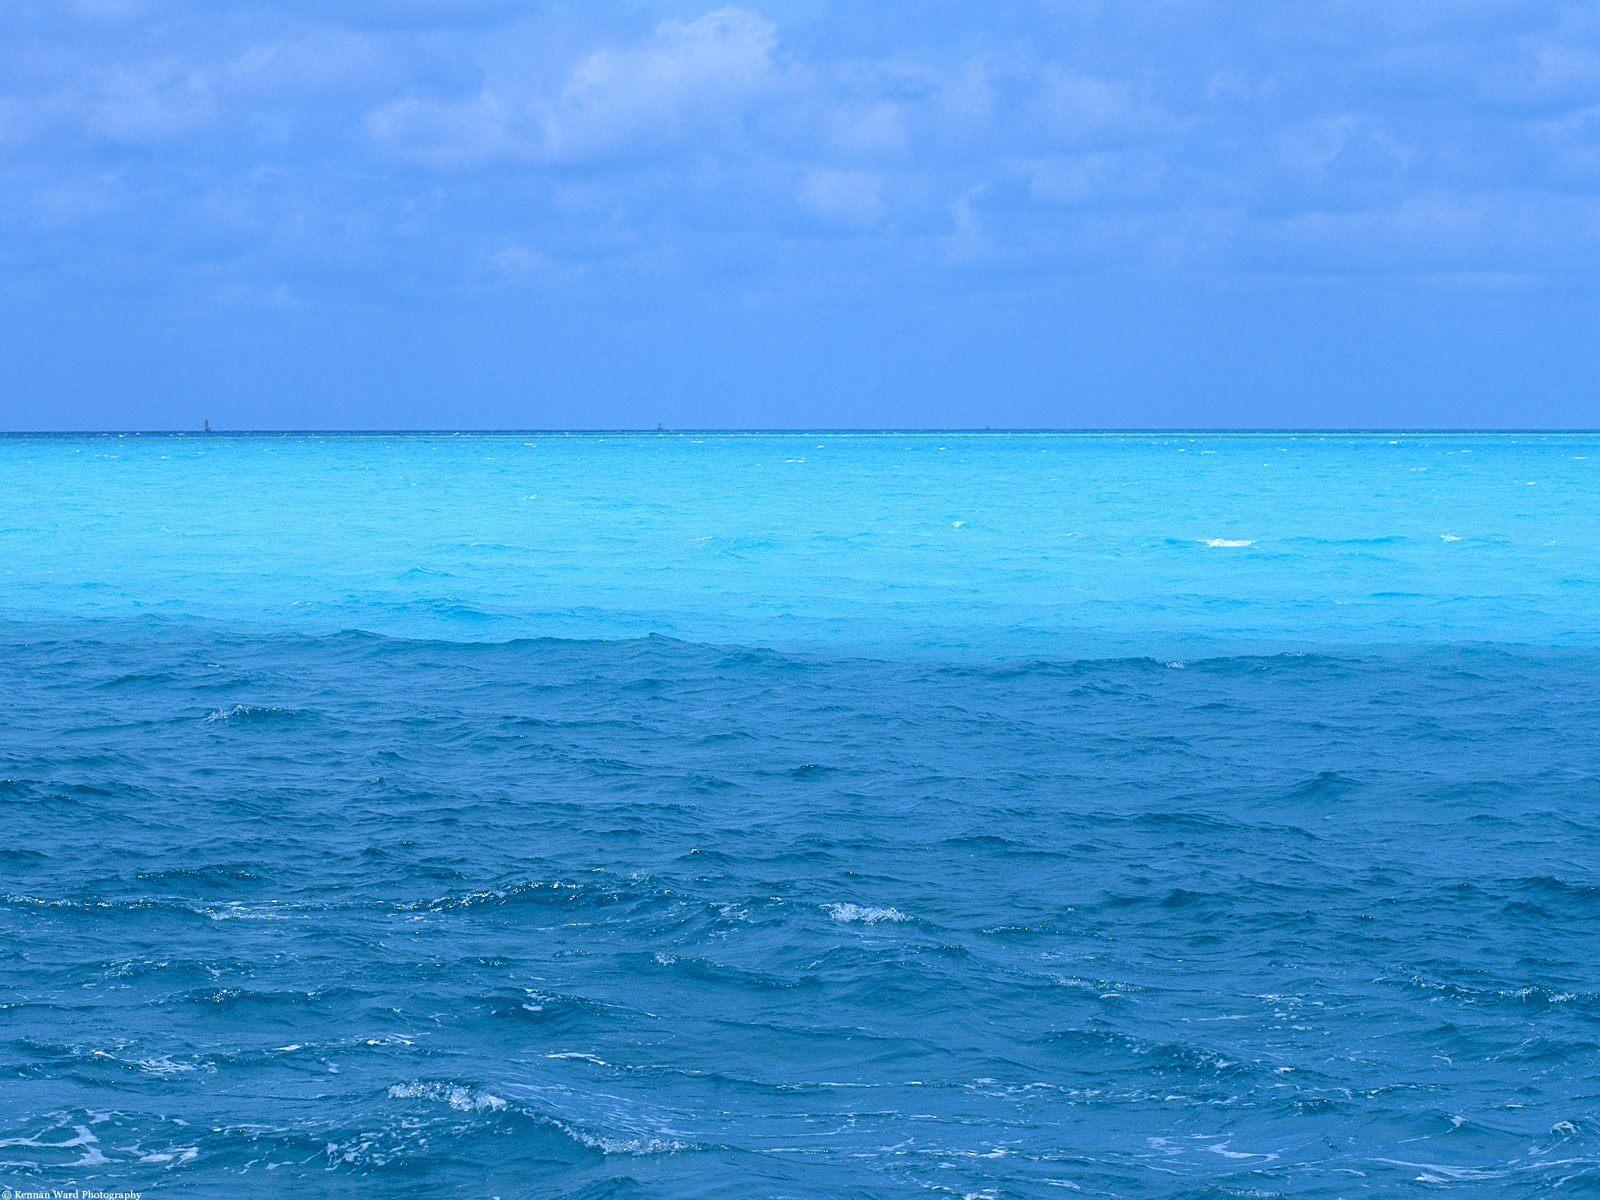 download ocean live wallpaper which is under the ocean wallpapers 1600x1200